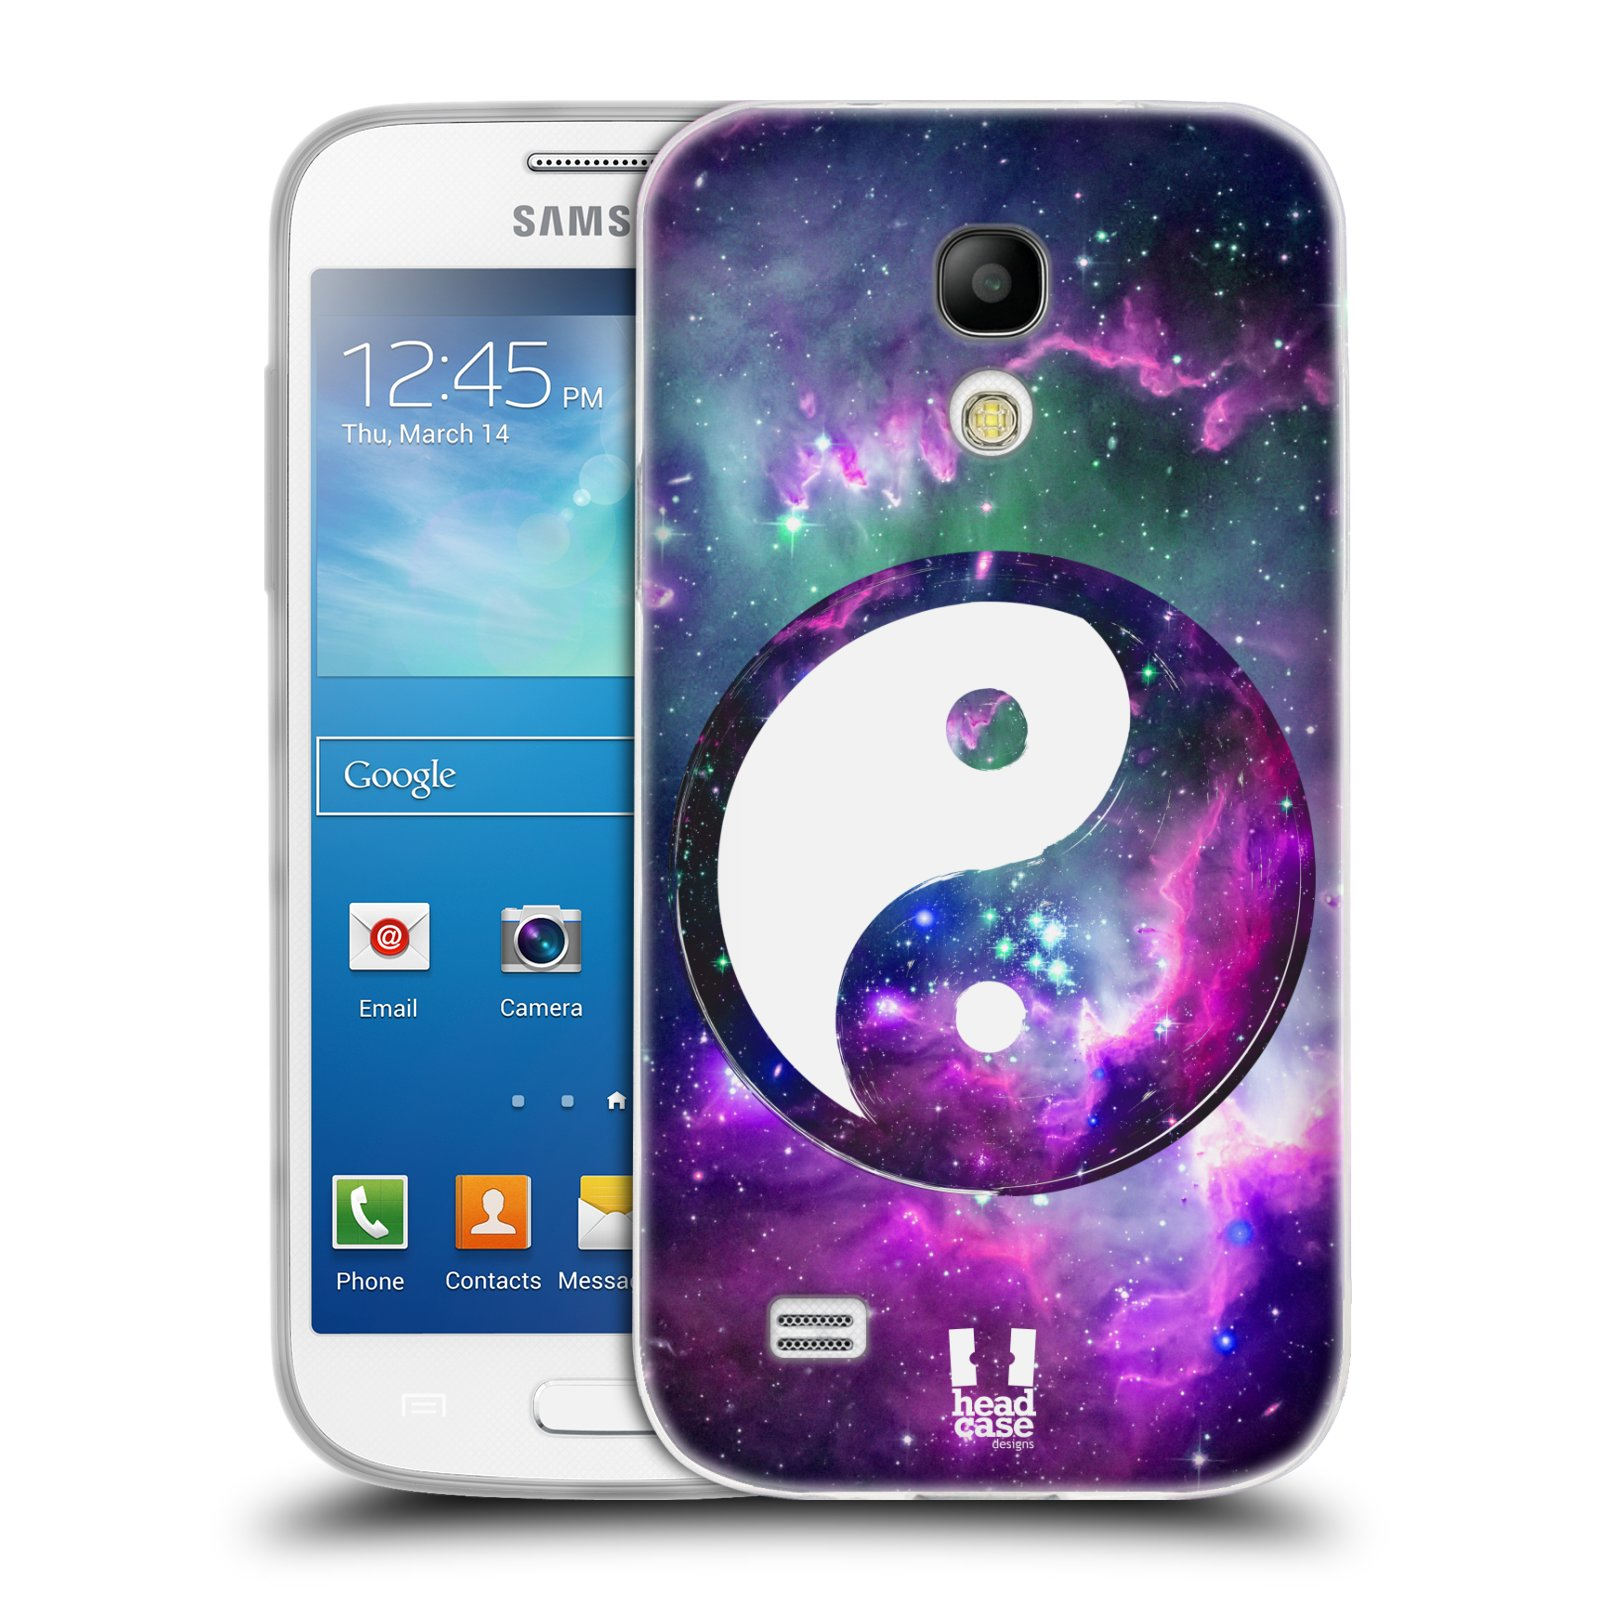 Silikonové pouzdro na mobil Samsung Galaxy S4 Mini HEAD CASE YIn a Yang PURPLE (Silikonový kryt či obal na mobilní telefon Samsung Galaxy S4 Mini GT-i9195 / i9190 (nepasuje na verzi Black Edition))